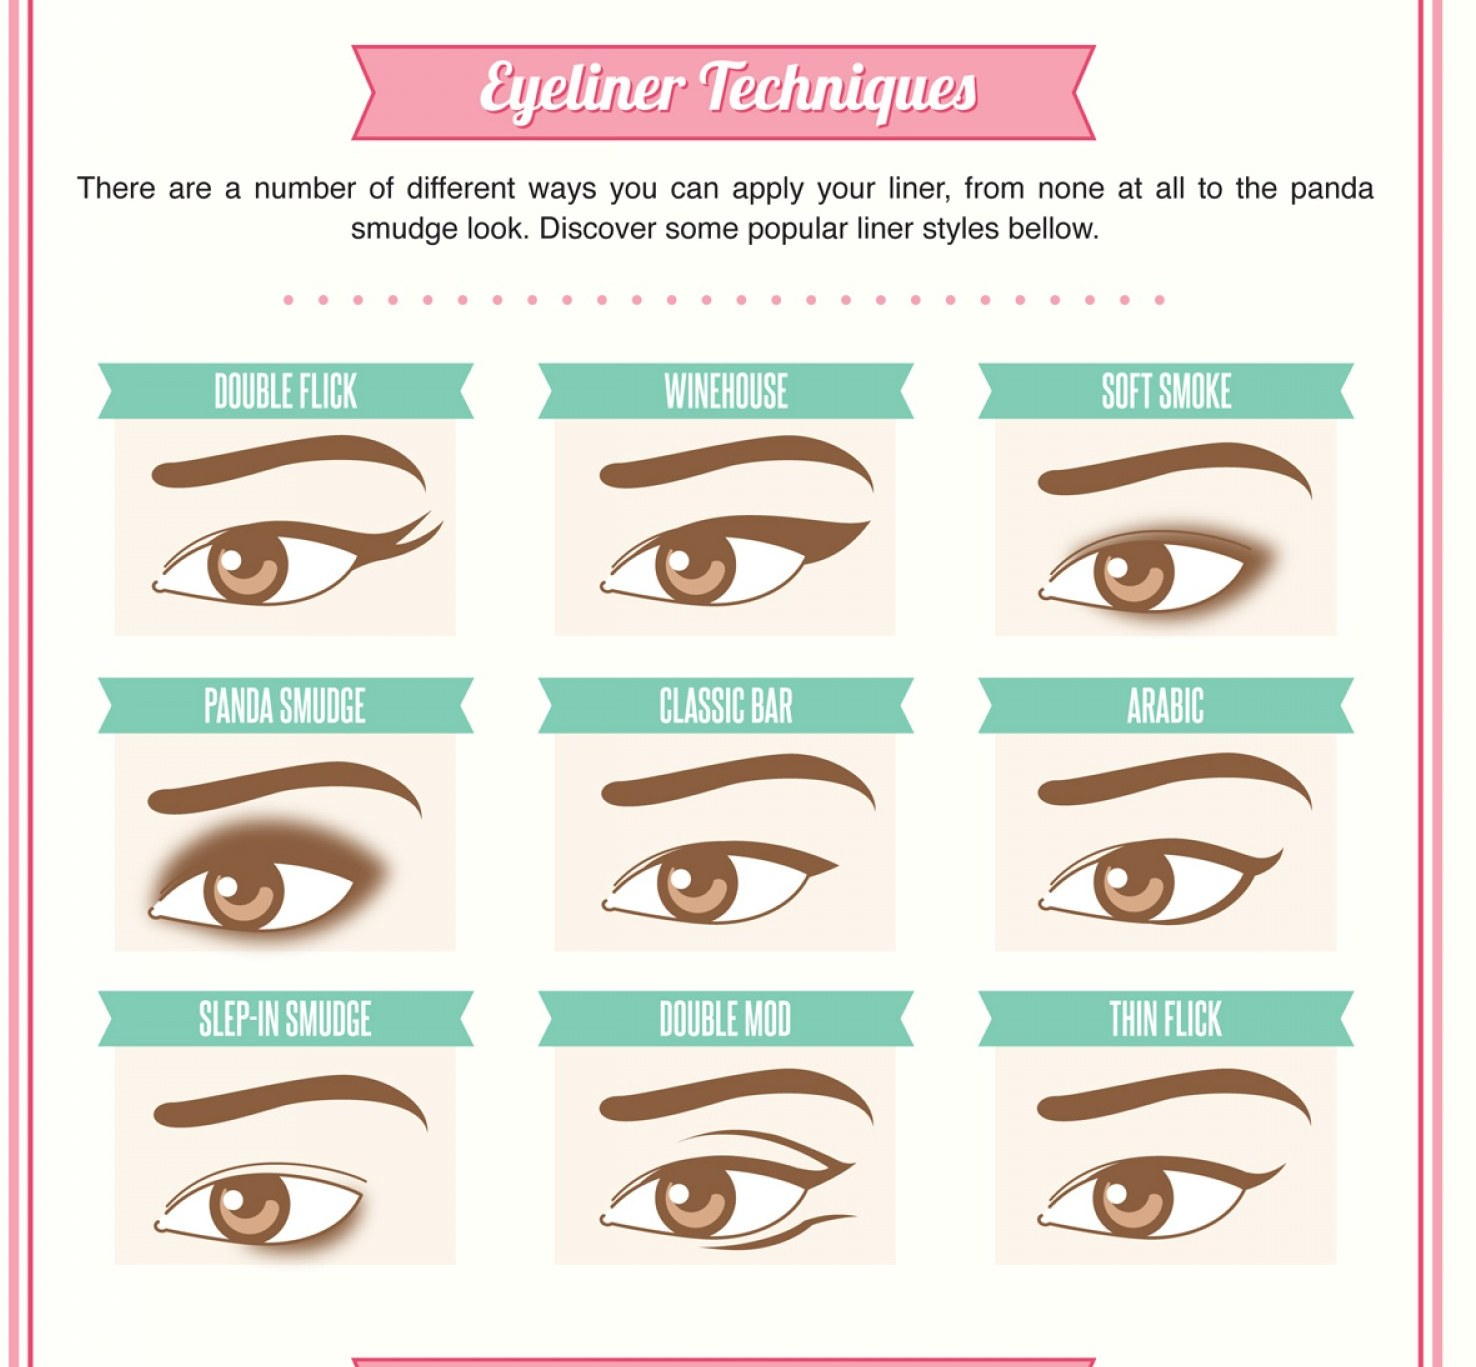 9 unbelievably simple steps to perfect makeup 53300a153e3d6 w1500 4